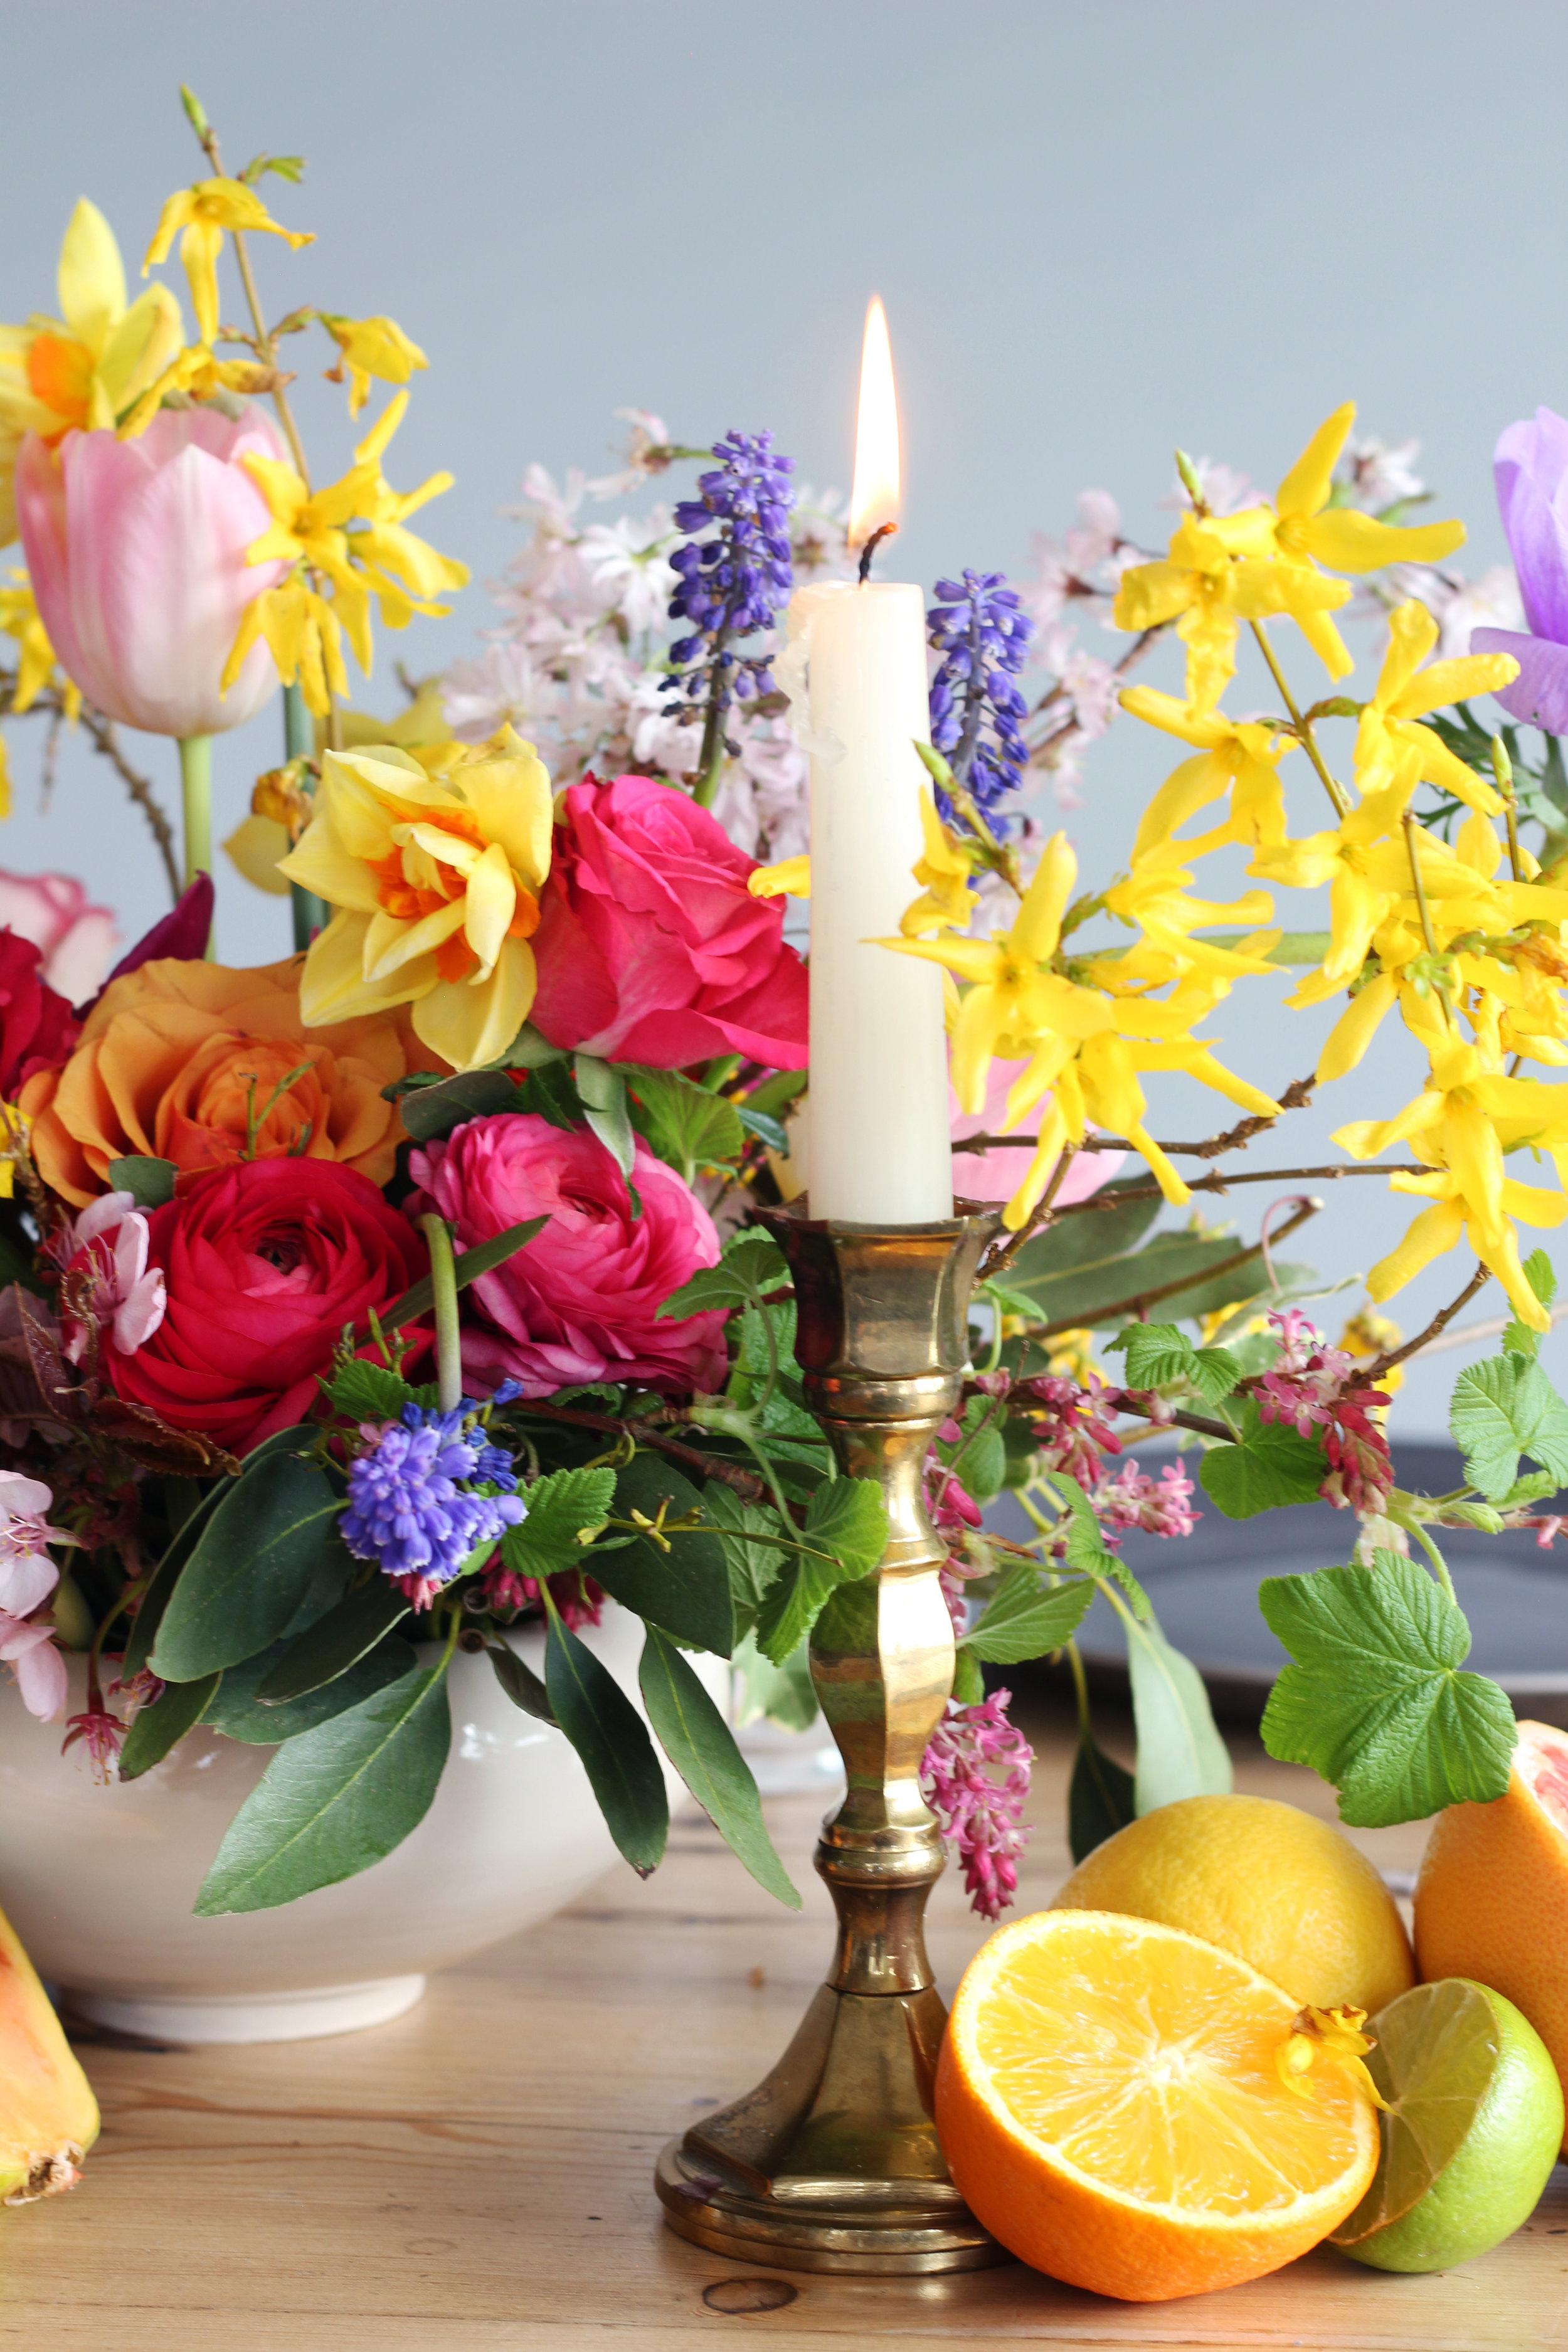 Callie-Pettigrew-Fruity-Florals-7.jpg